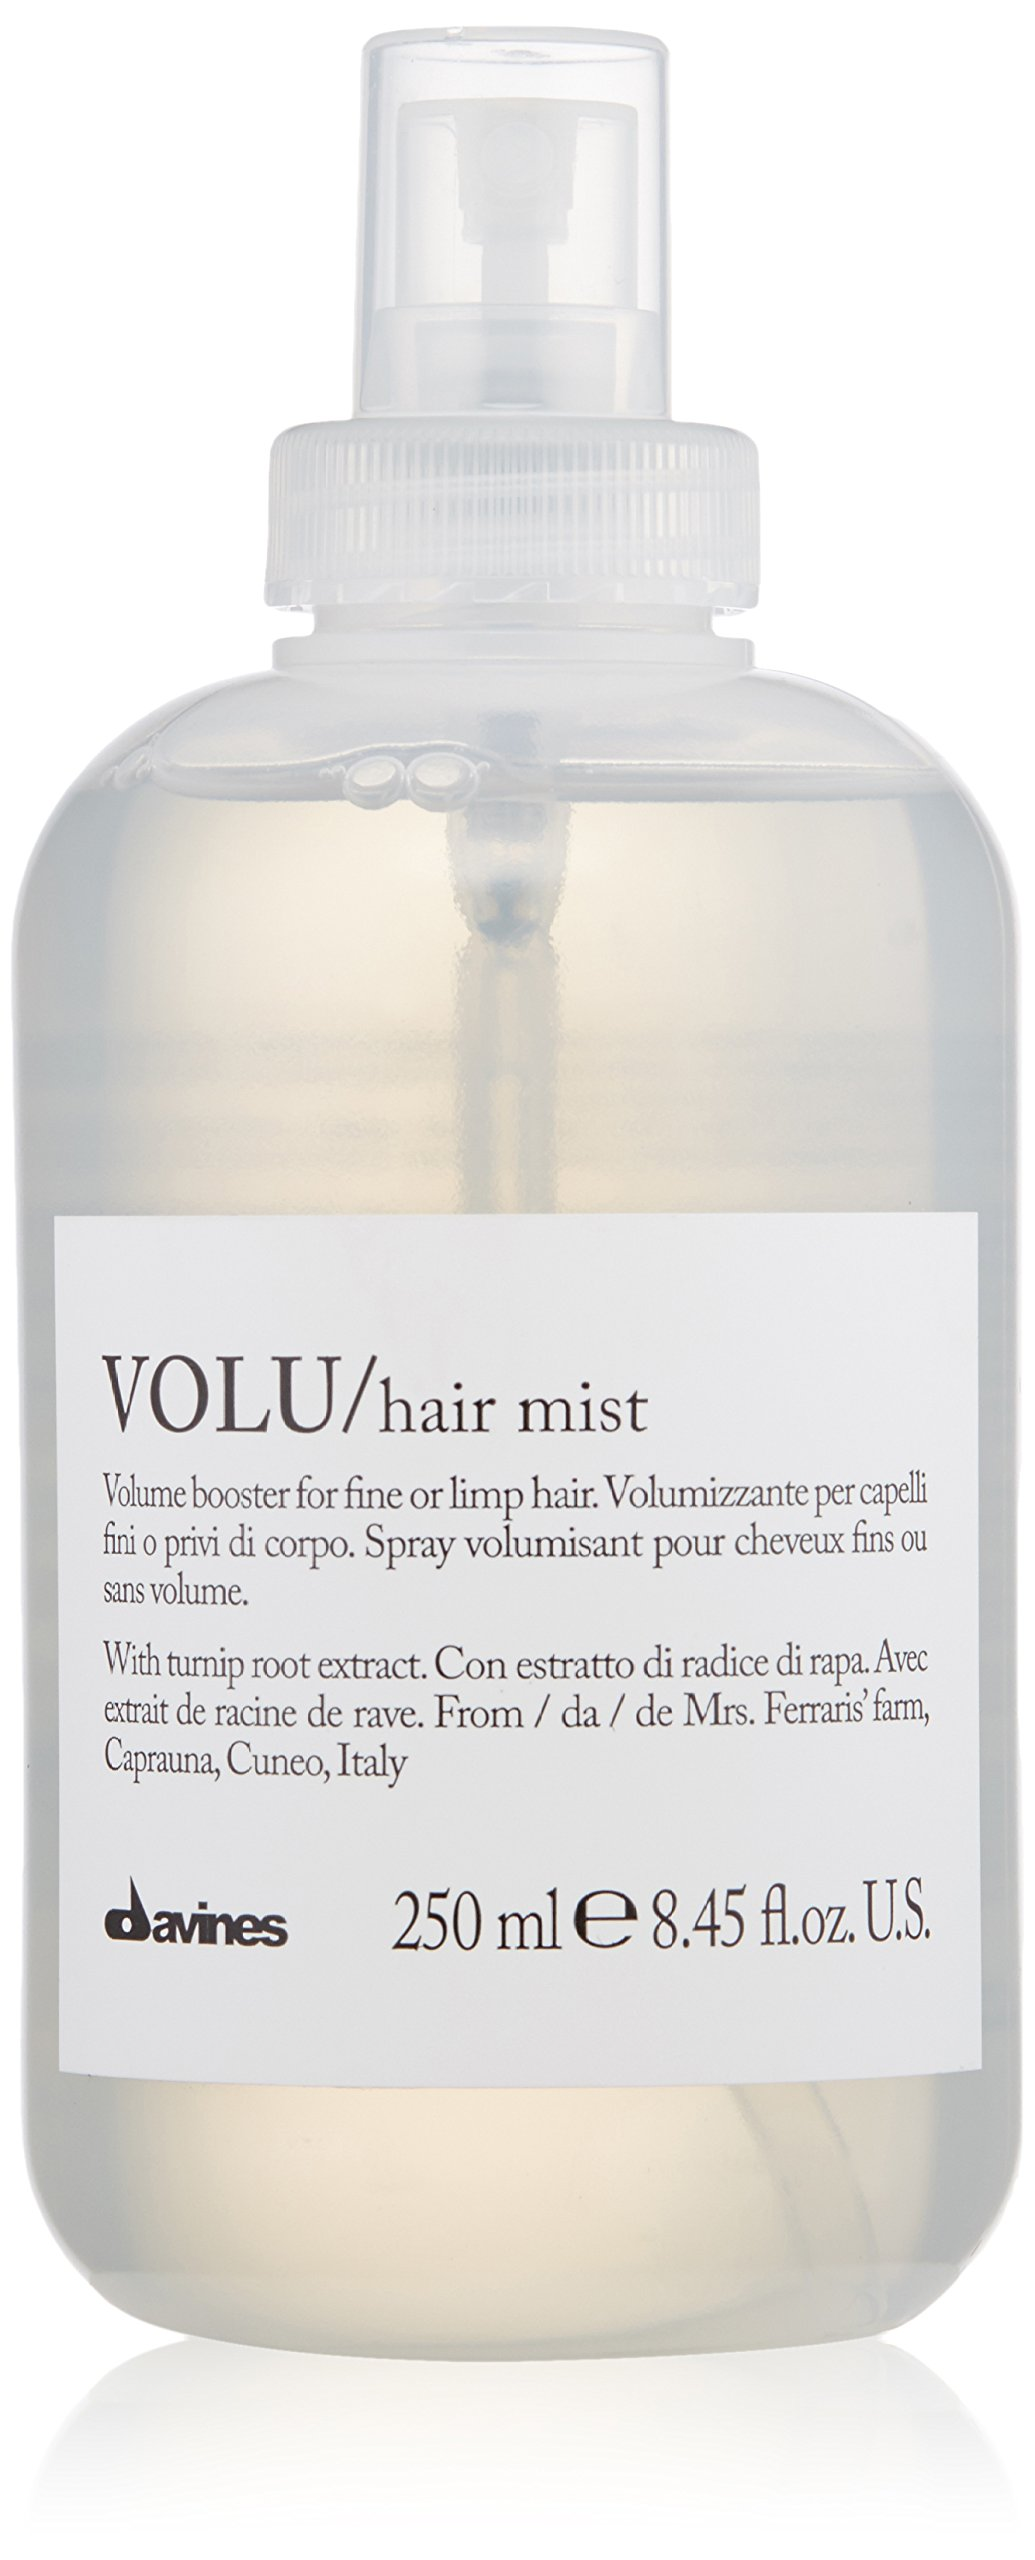 Davines Volu Hair Mist, 8.45 fl. oz.